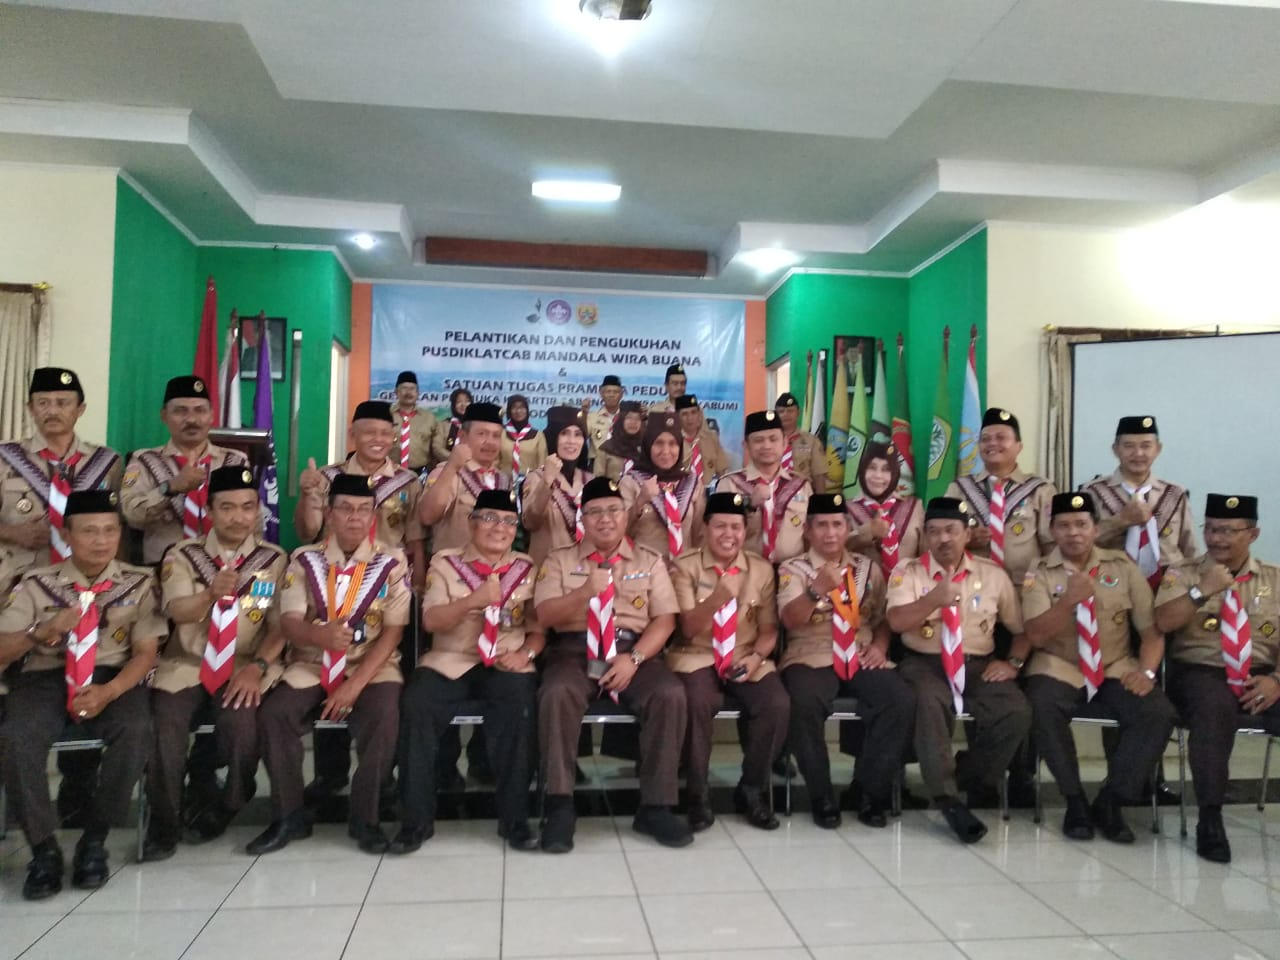 M. Solihin bersama Jajaran Pengurus Kwarcab Pramuka Kabupaten Sukabumi.